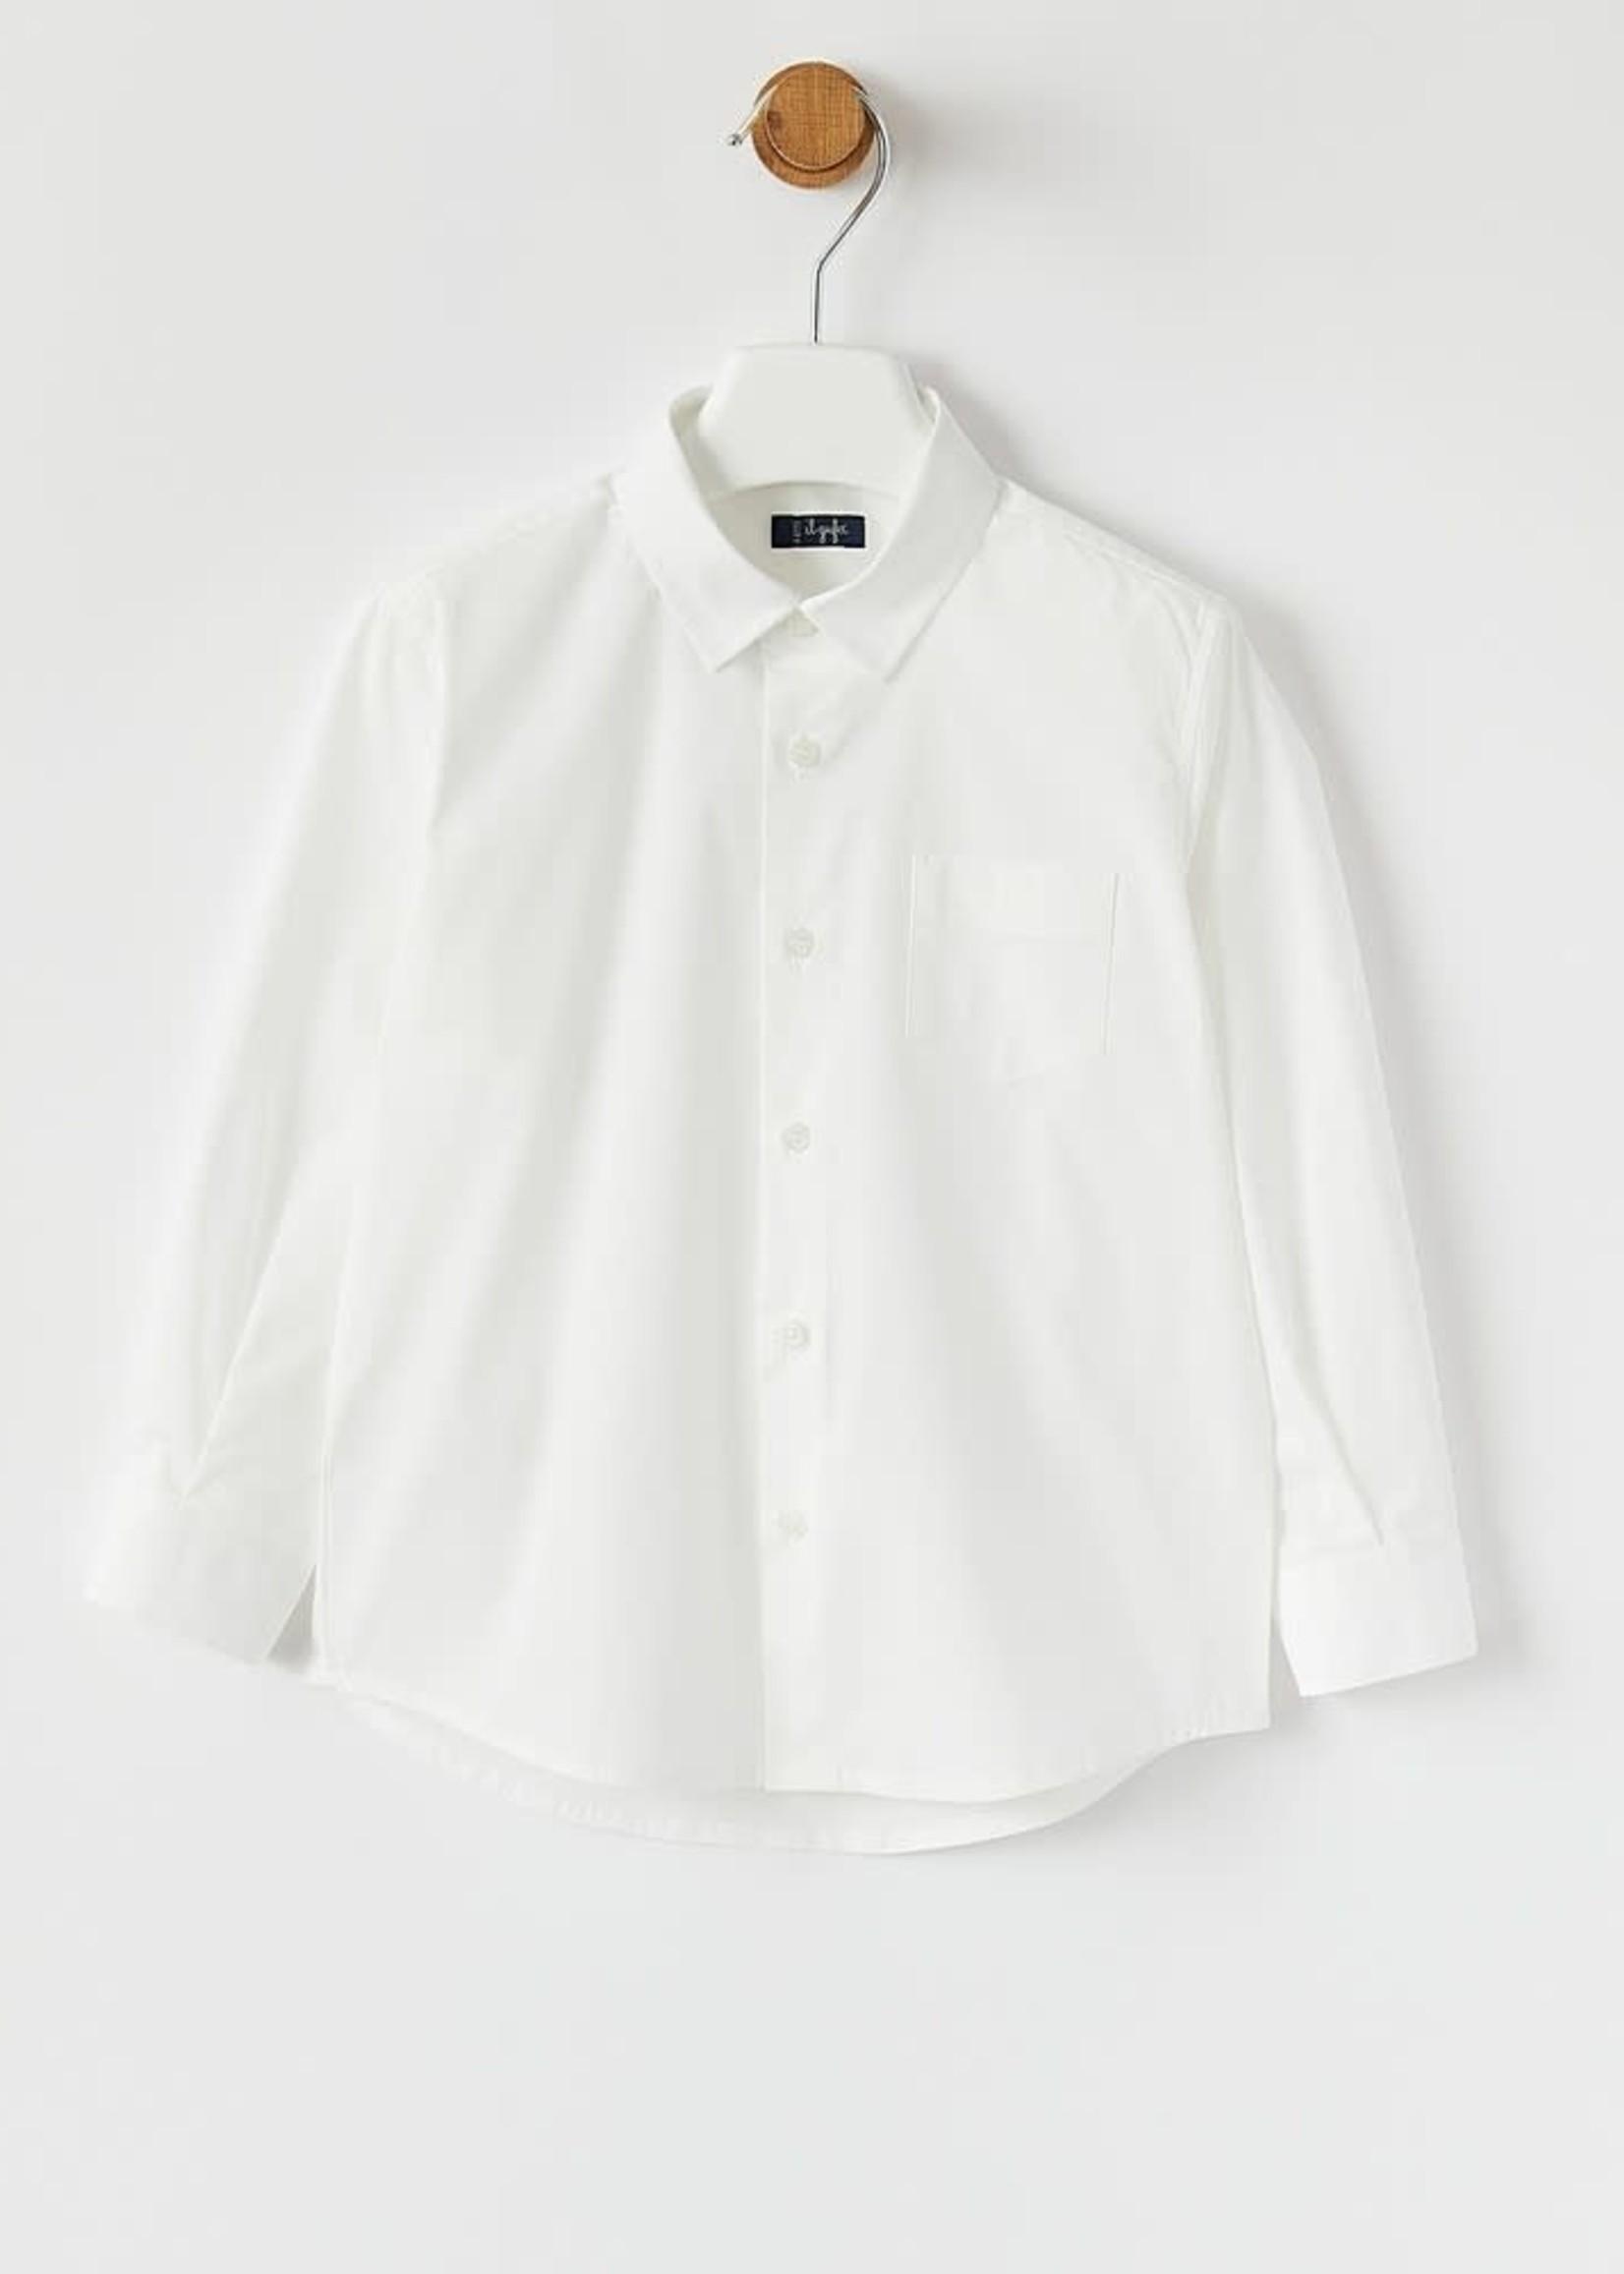 Il Gufo Il Gufo-AW21 BOYS BUTTON DOWN DRESS SHIRT W/COLLAR   A21 CL110